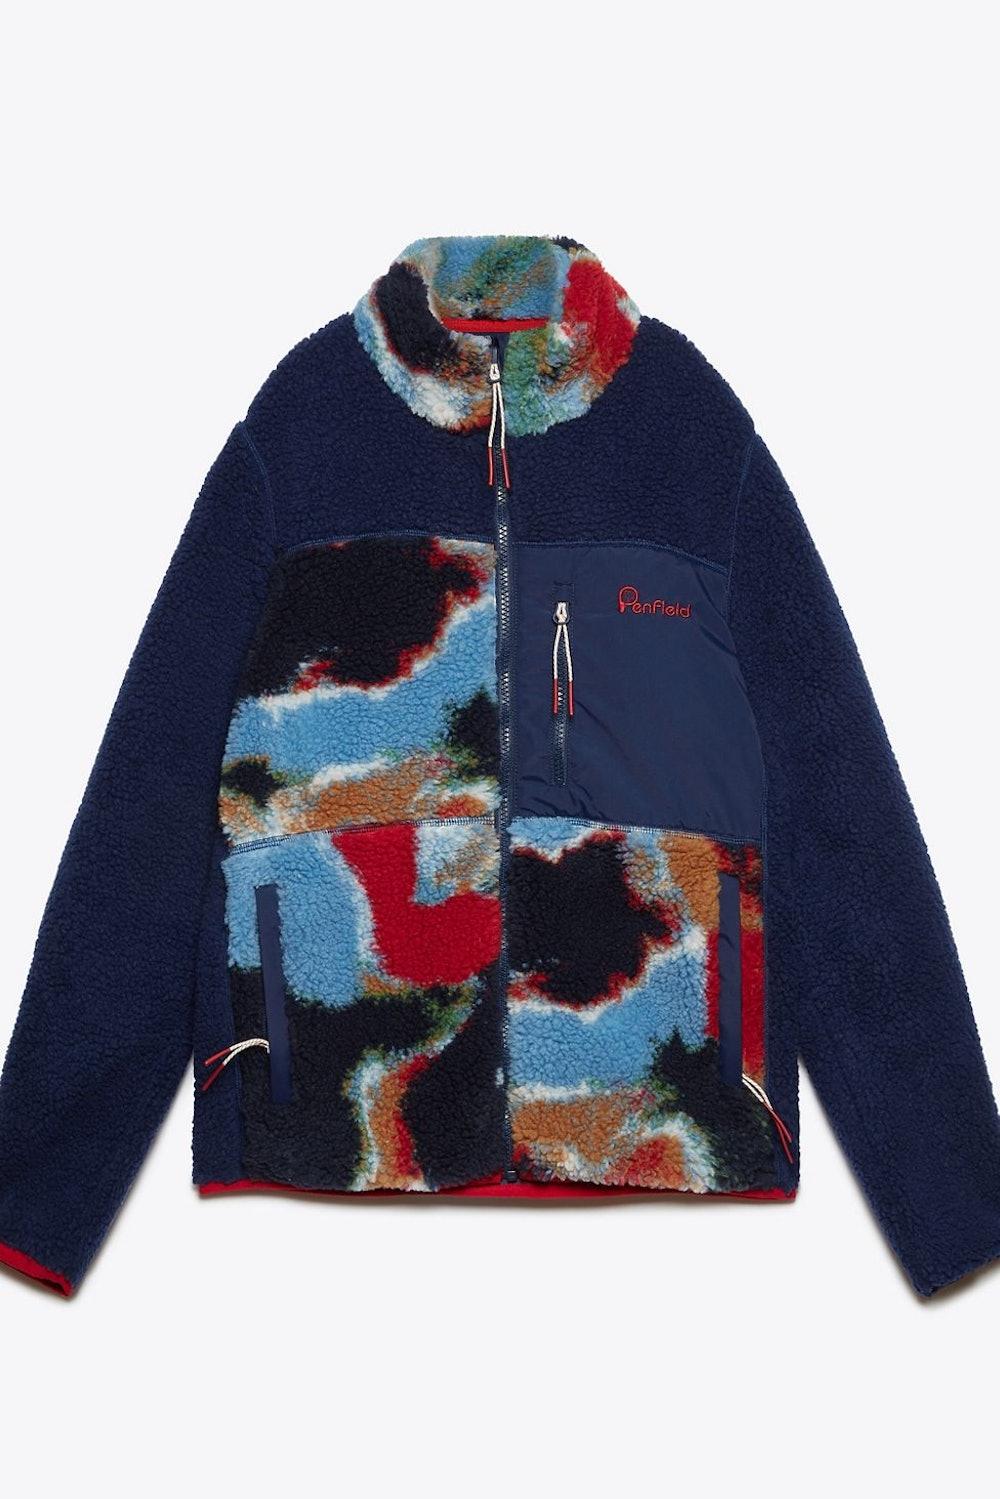 Mattawa Fleece Jacket